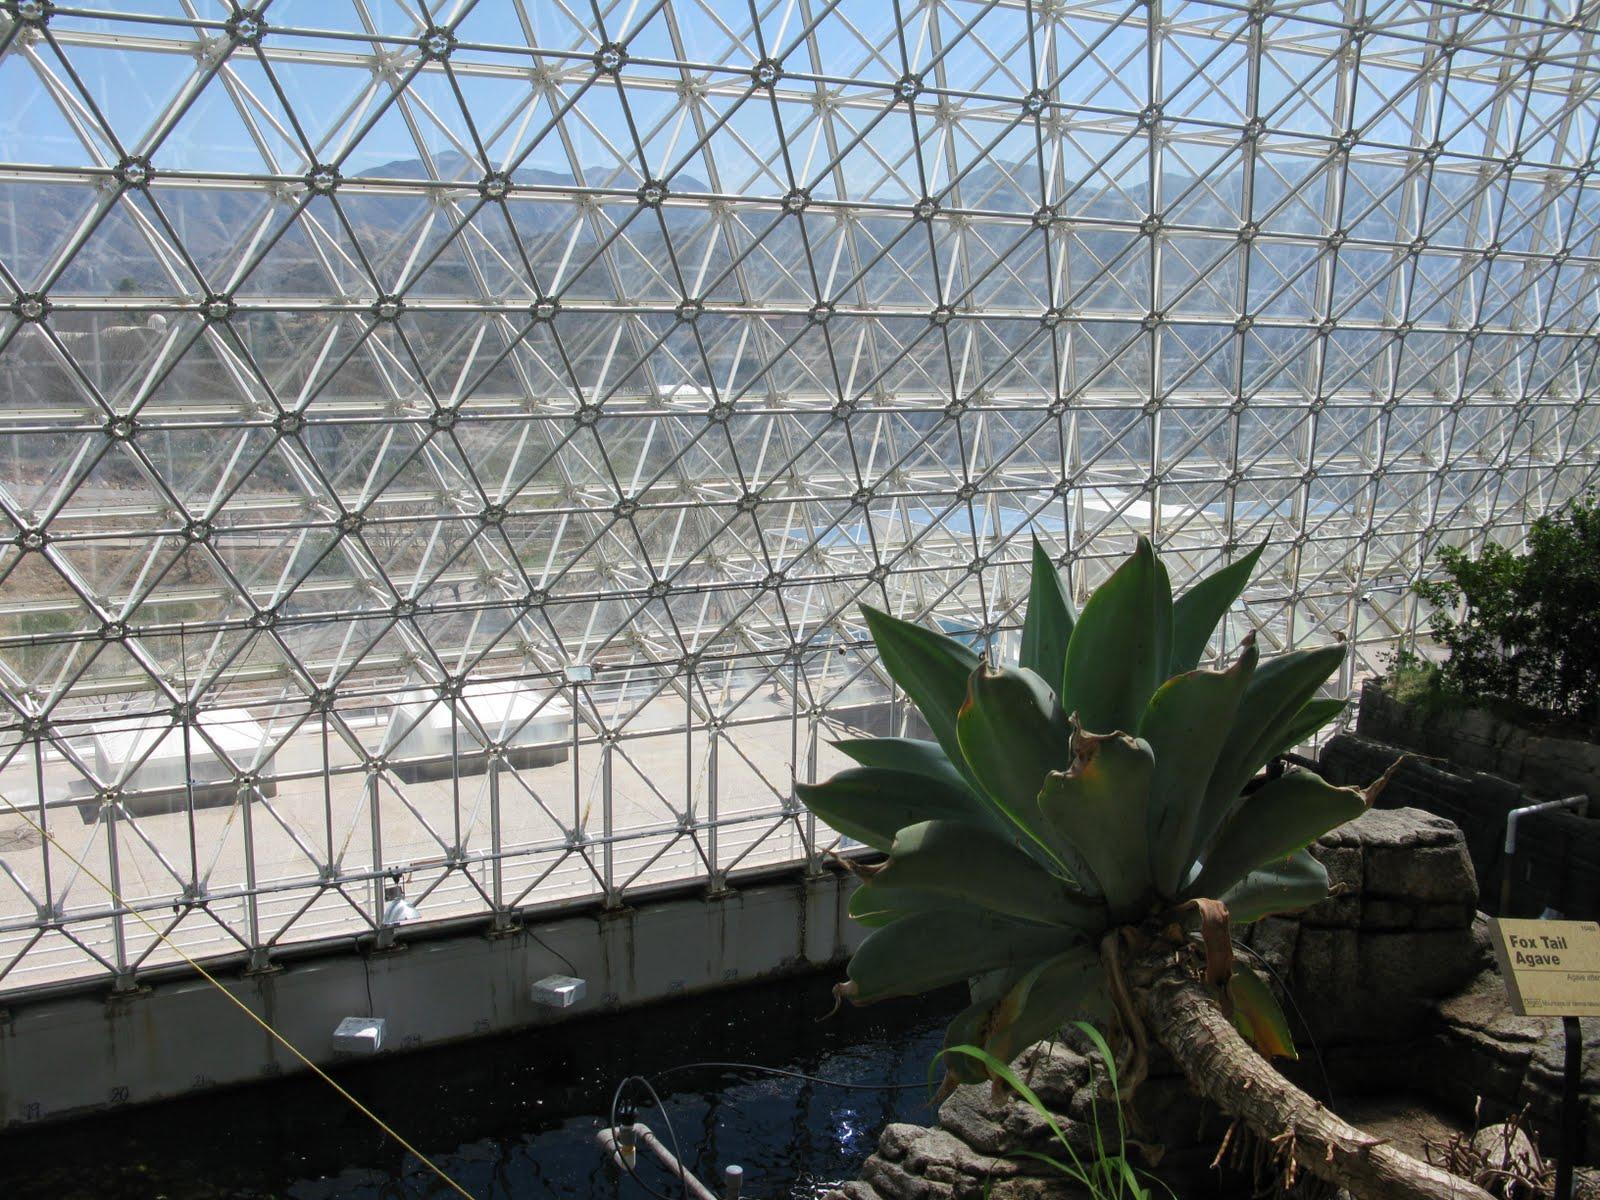 Biosphere n plants blogspot home.